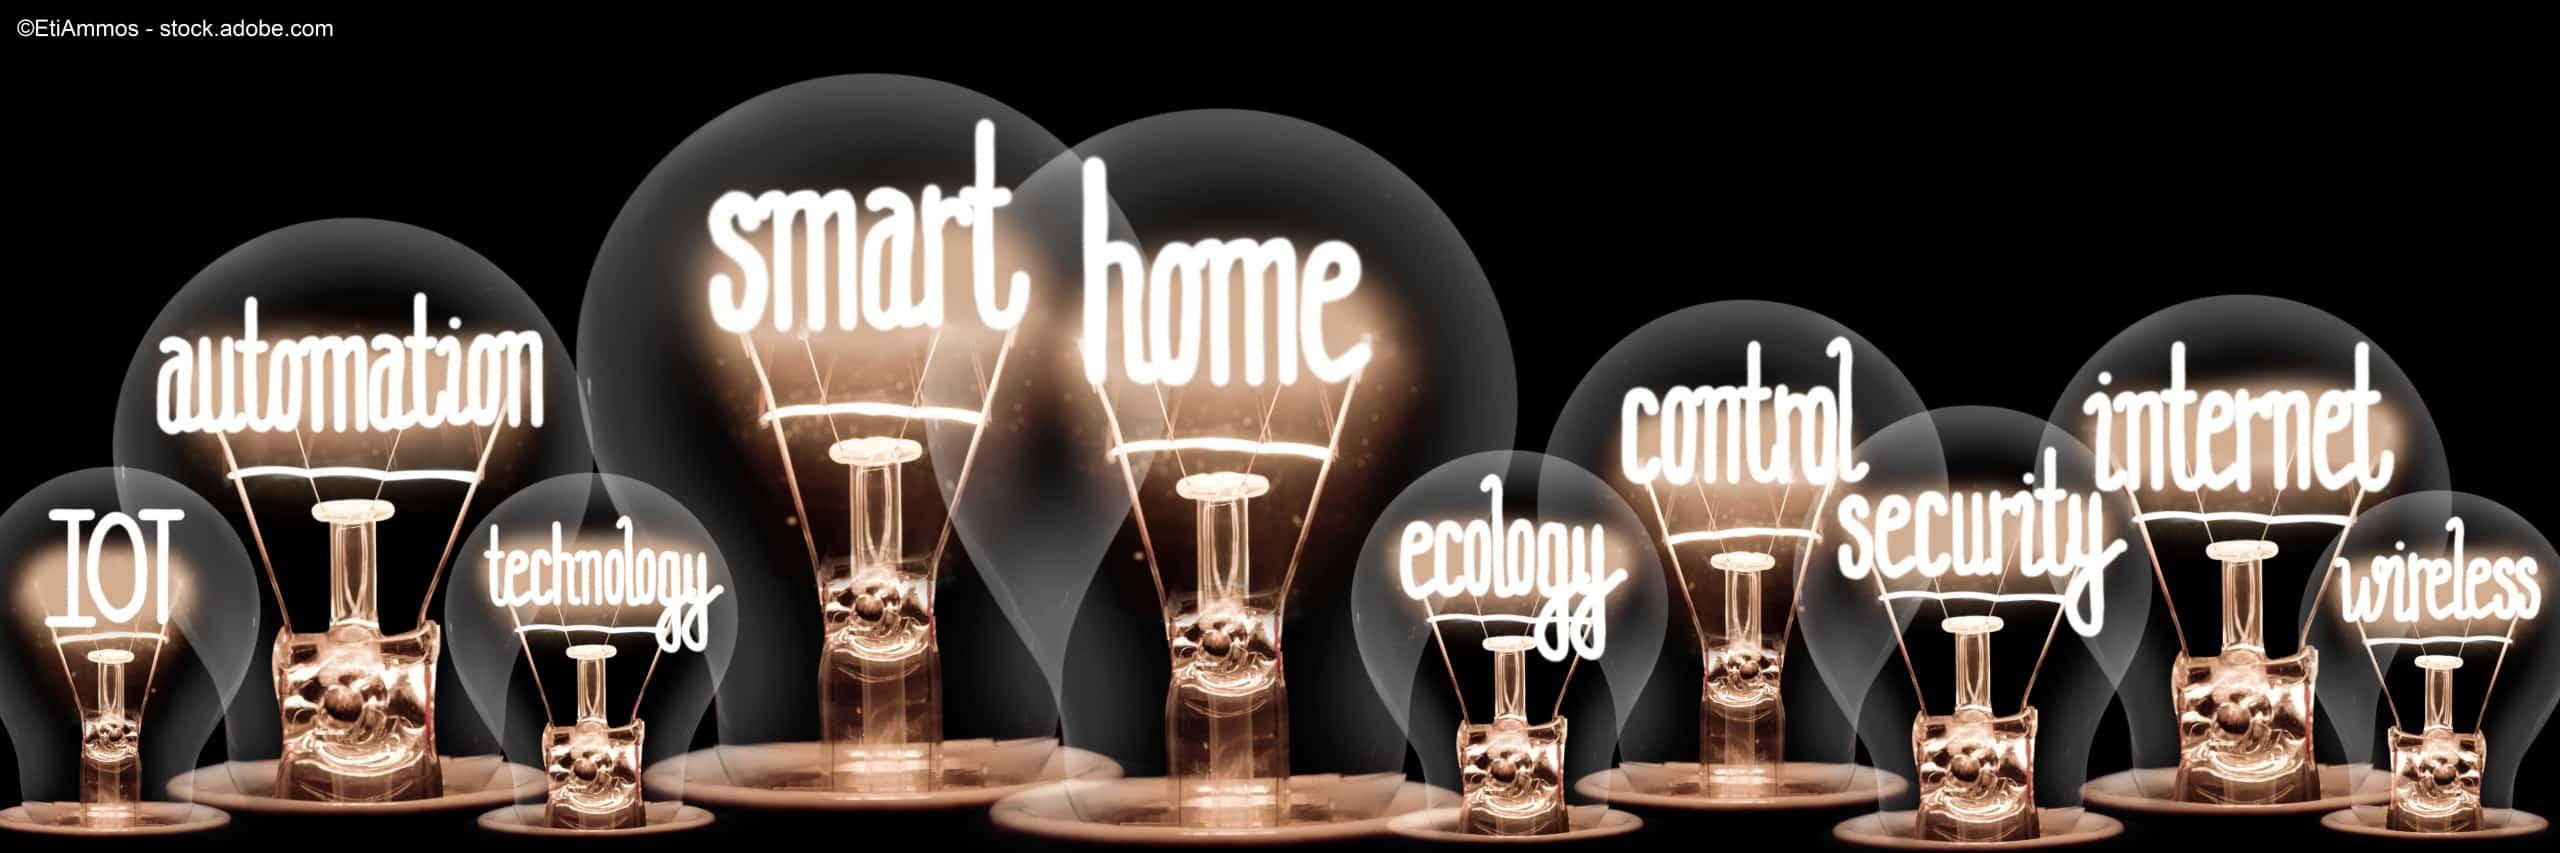 wlan hotspot smarthome smart home wifi